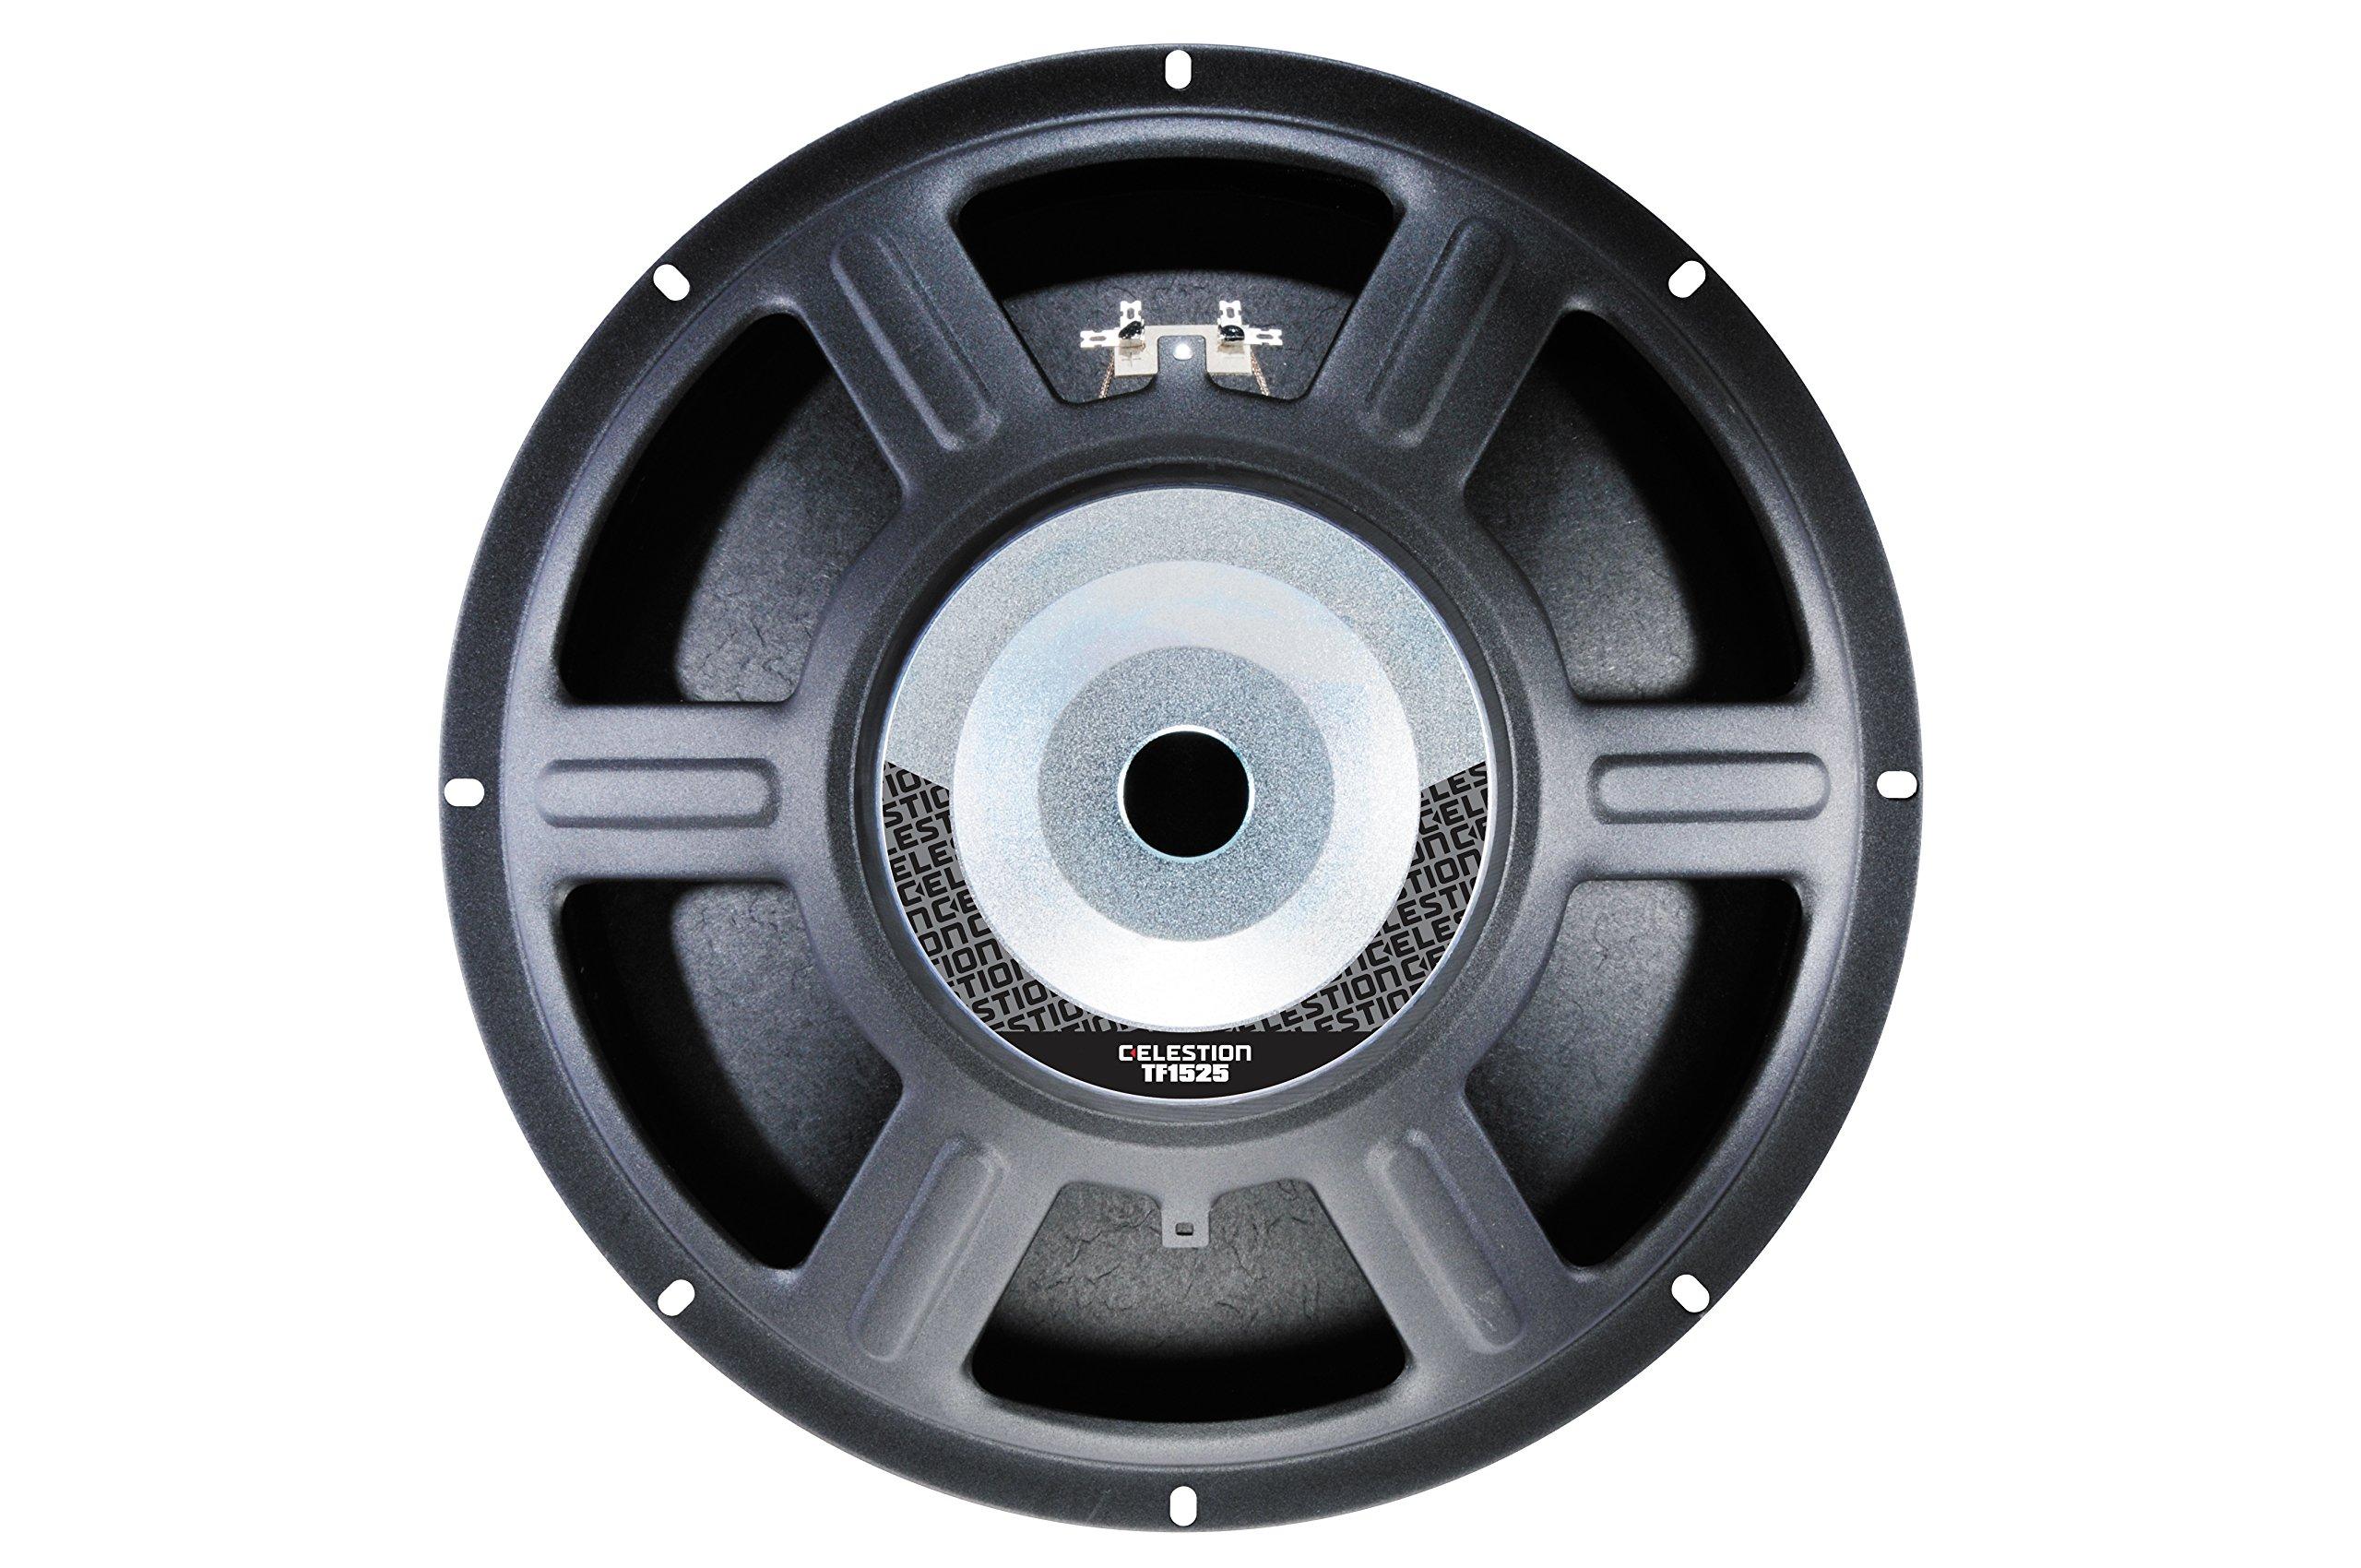 Celestion TF 1525 250 Watt Raw Frame Speaker 8 Ohm, 15 inch by CELESTION